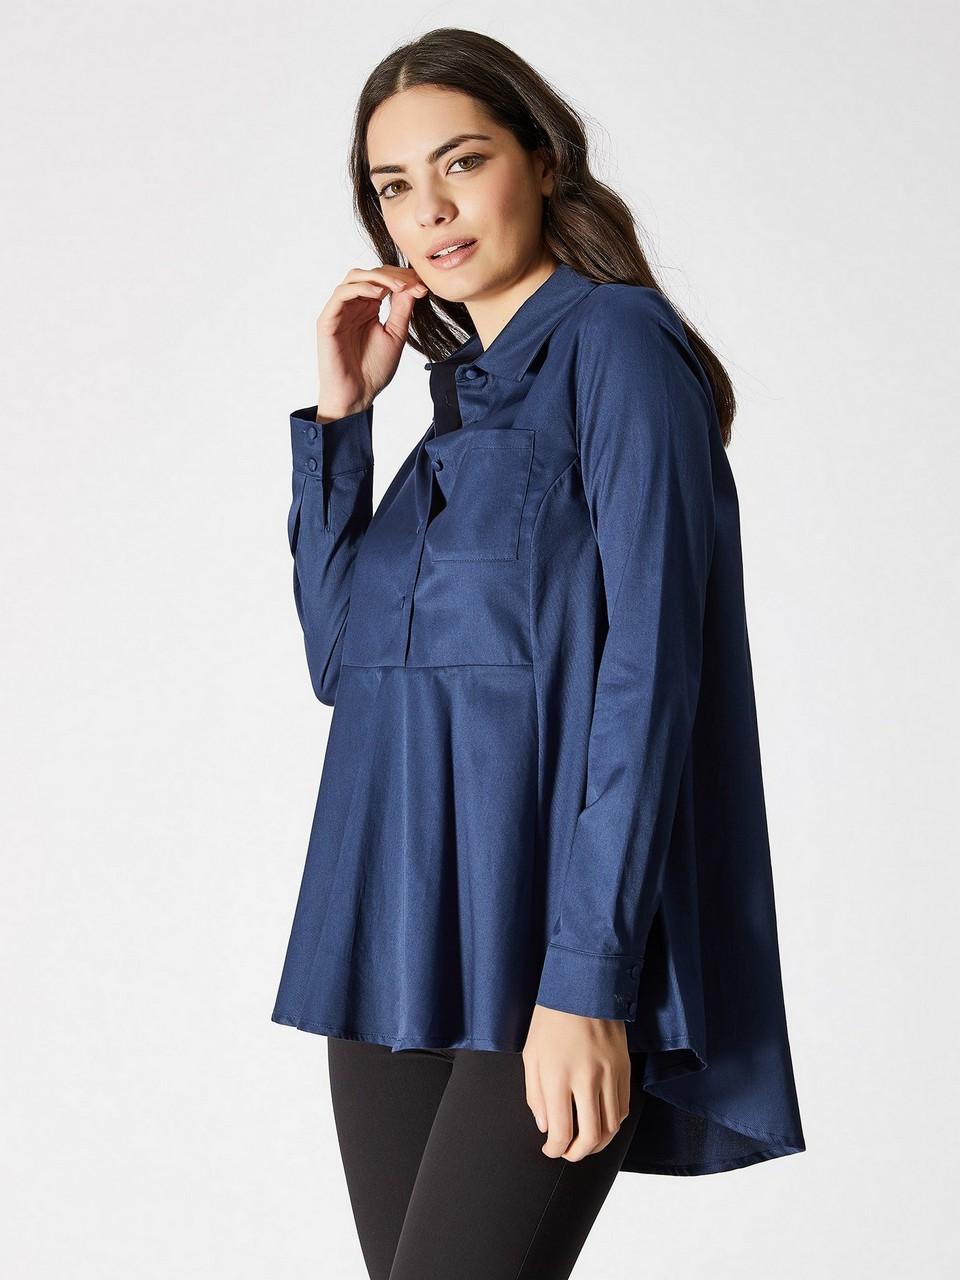 Asymmetrical Cut Pocket Detailed Shirt